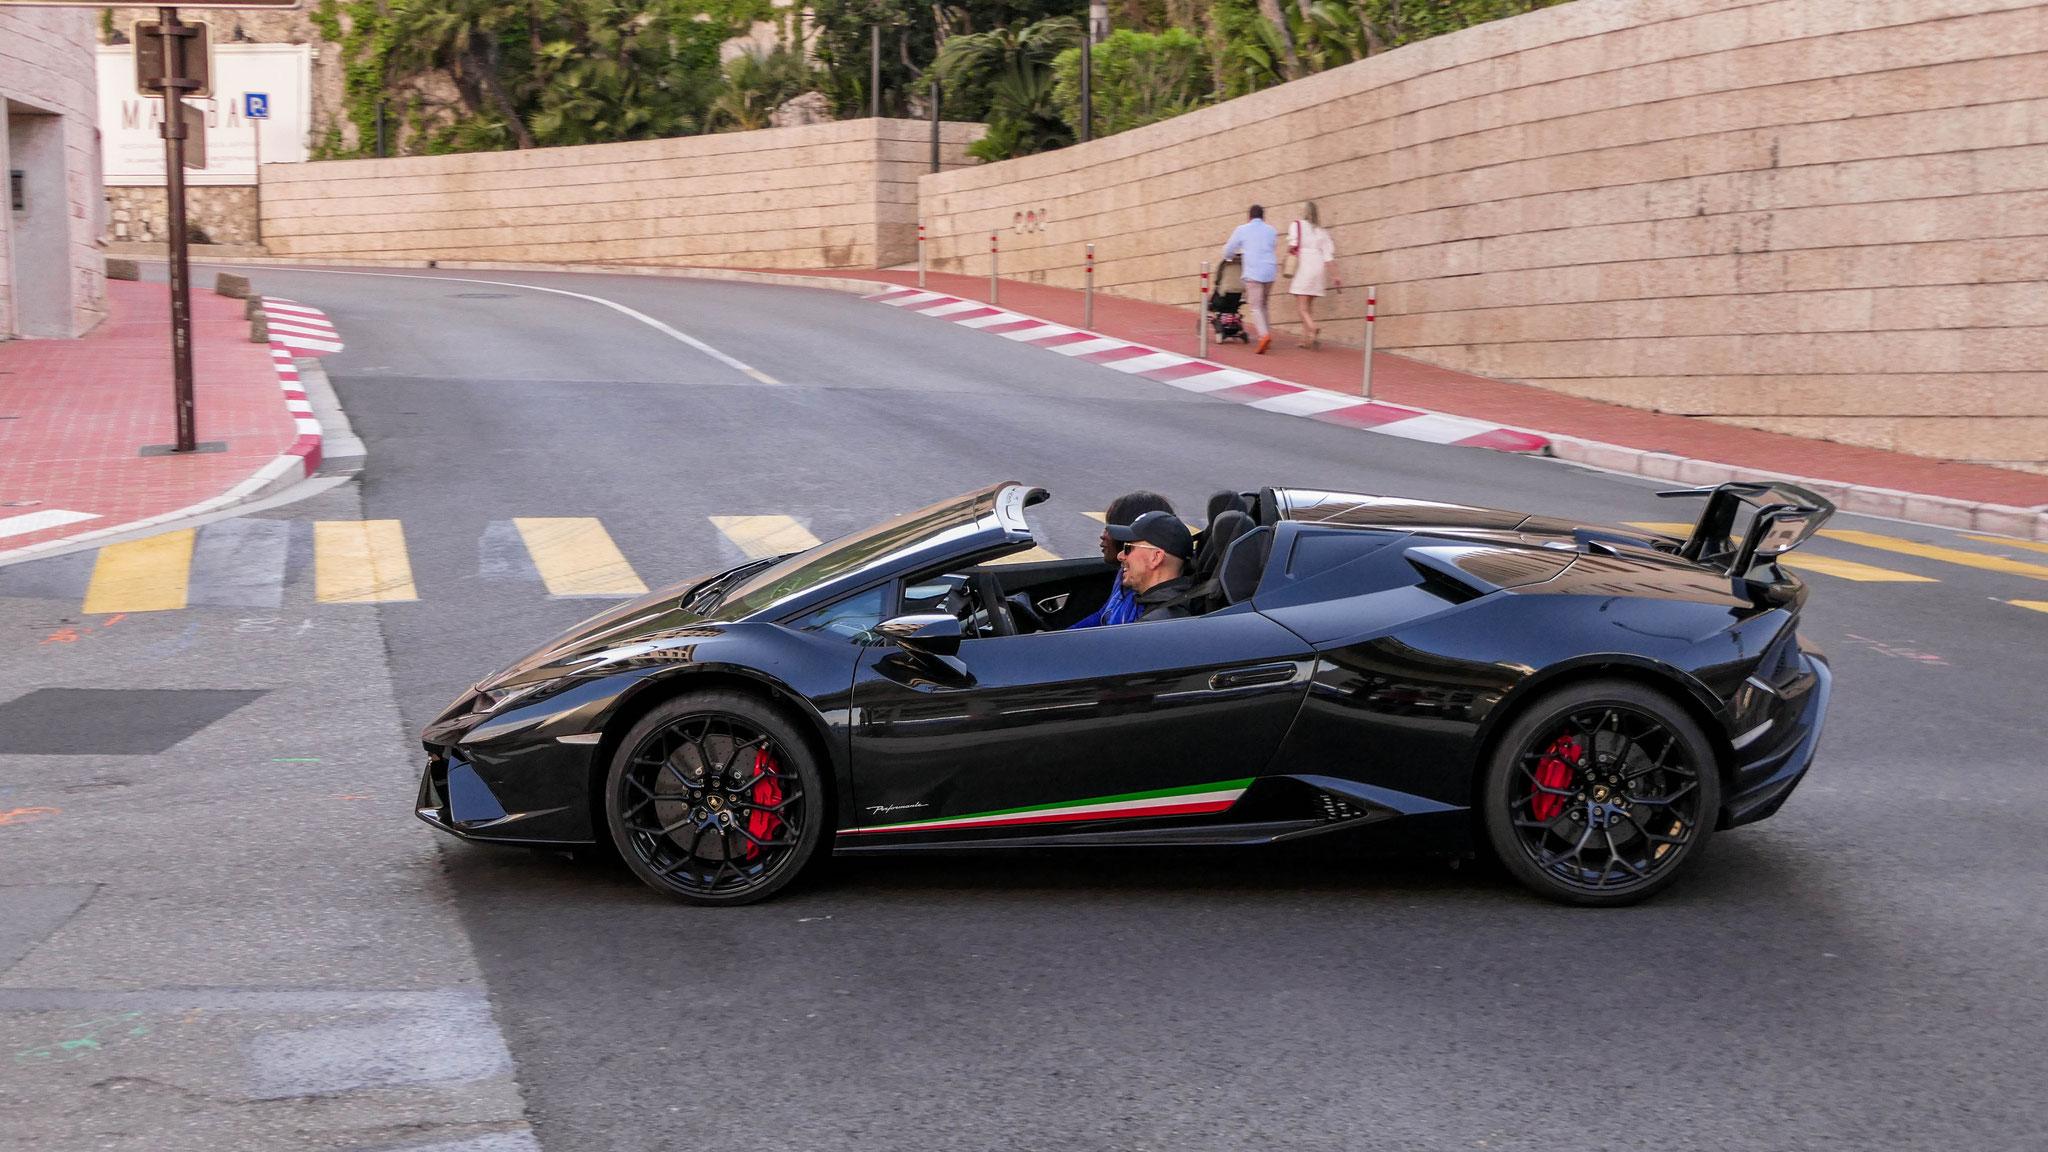 Lamborghini Huracan Performante Spyder - FF-072-JL-06 (FRA)